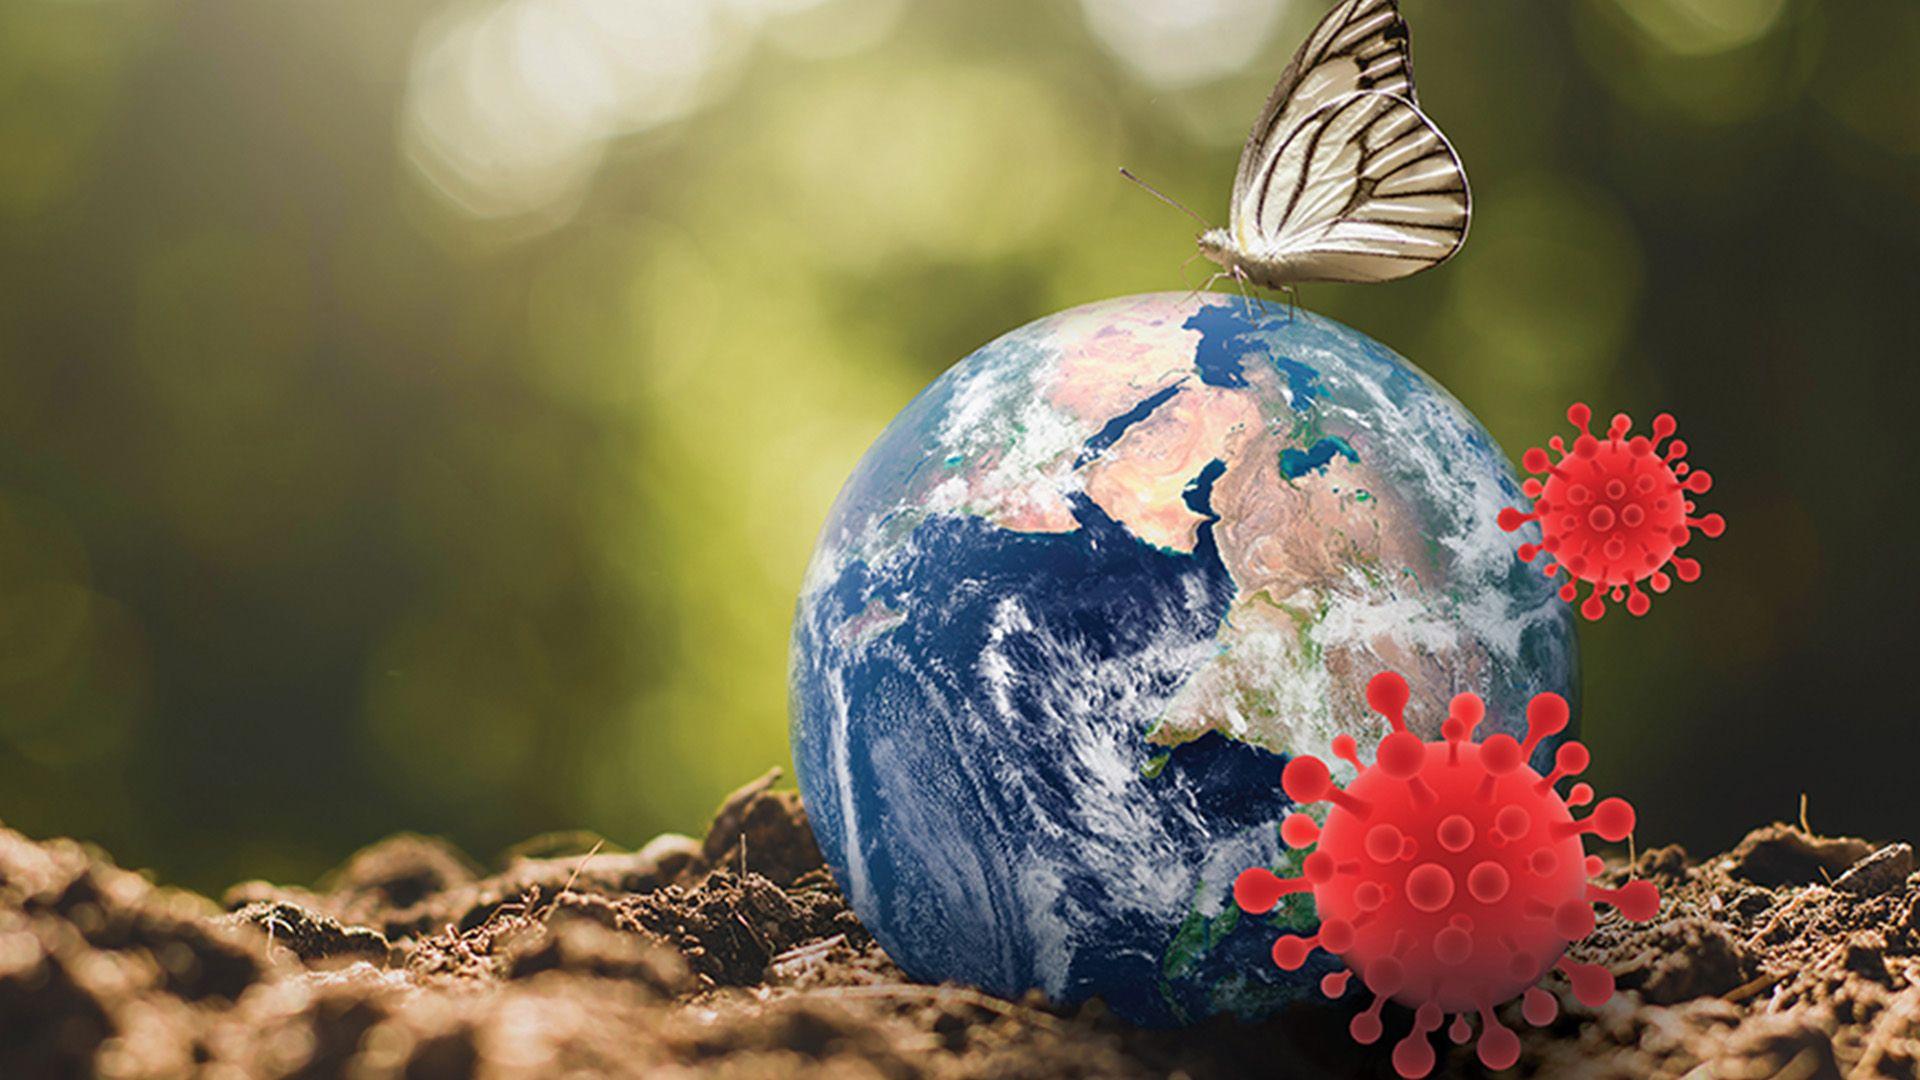 building sustainable planet, Sustainability